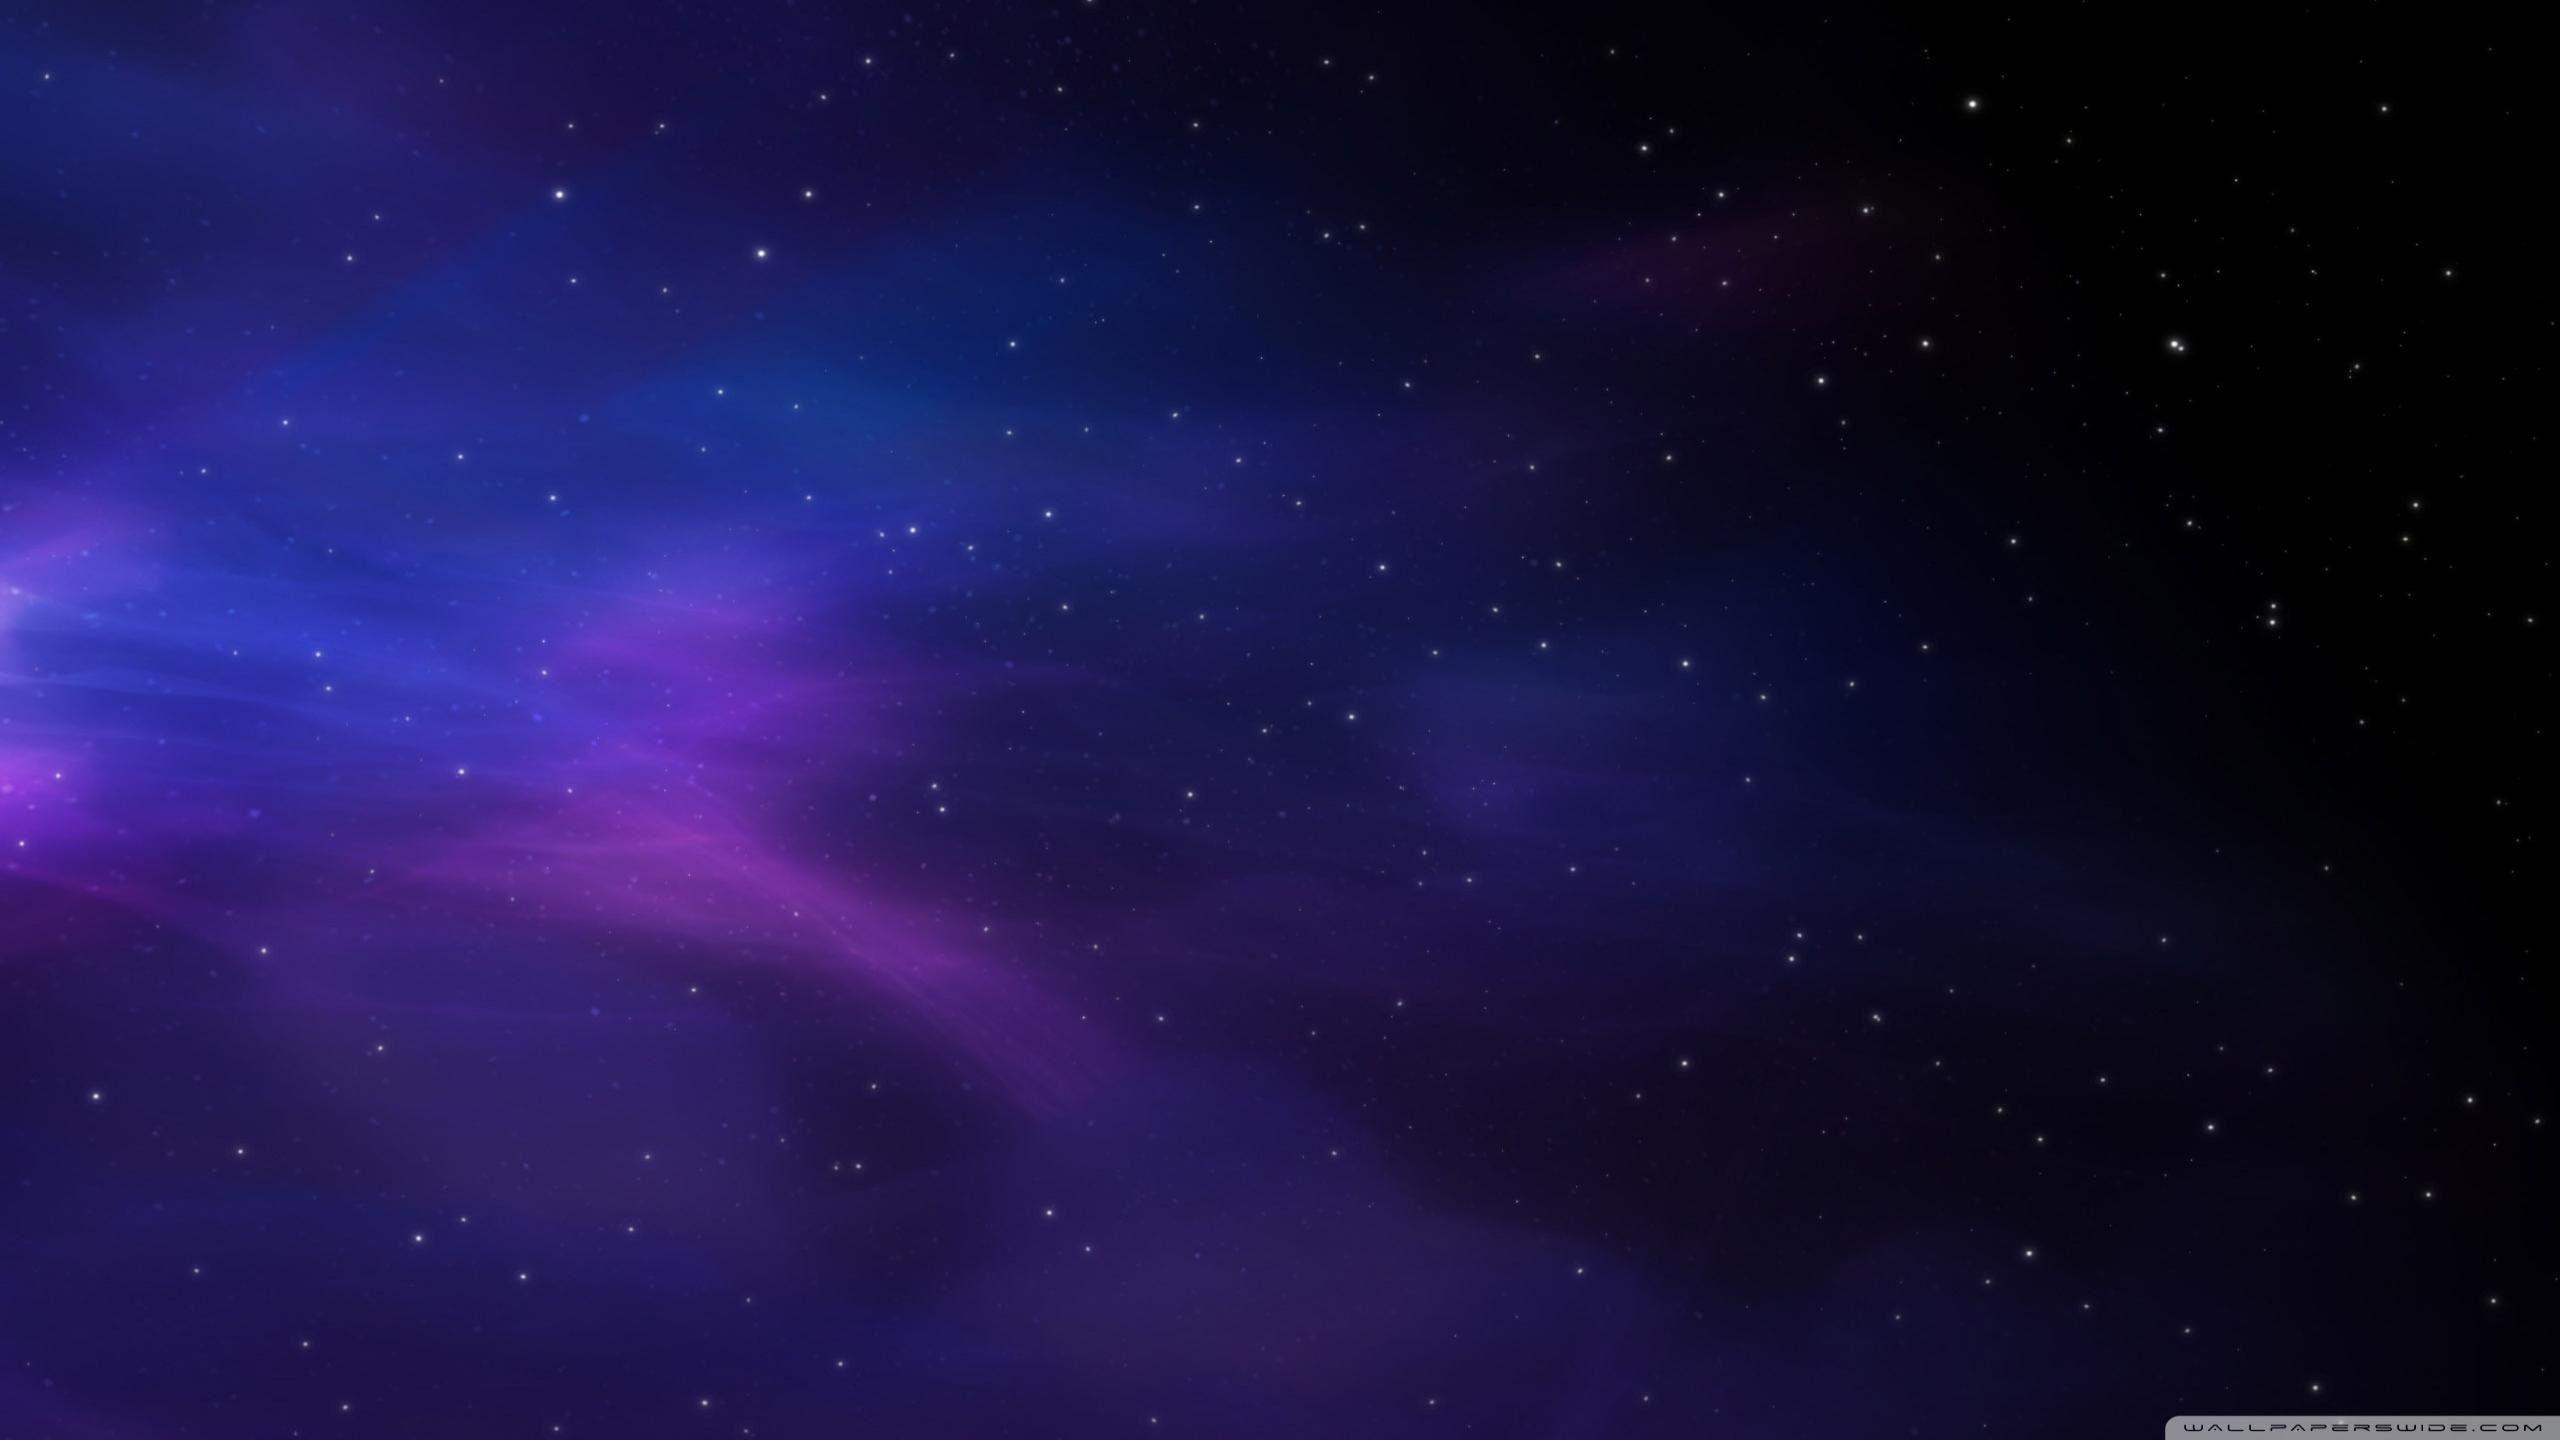 Tumblr Backgrounds Galaxy Galaxy Wallpaper Tumblr Hd Wallpapers Galaxy Wallpaper Galaxy Background Qhd Wallpaper